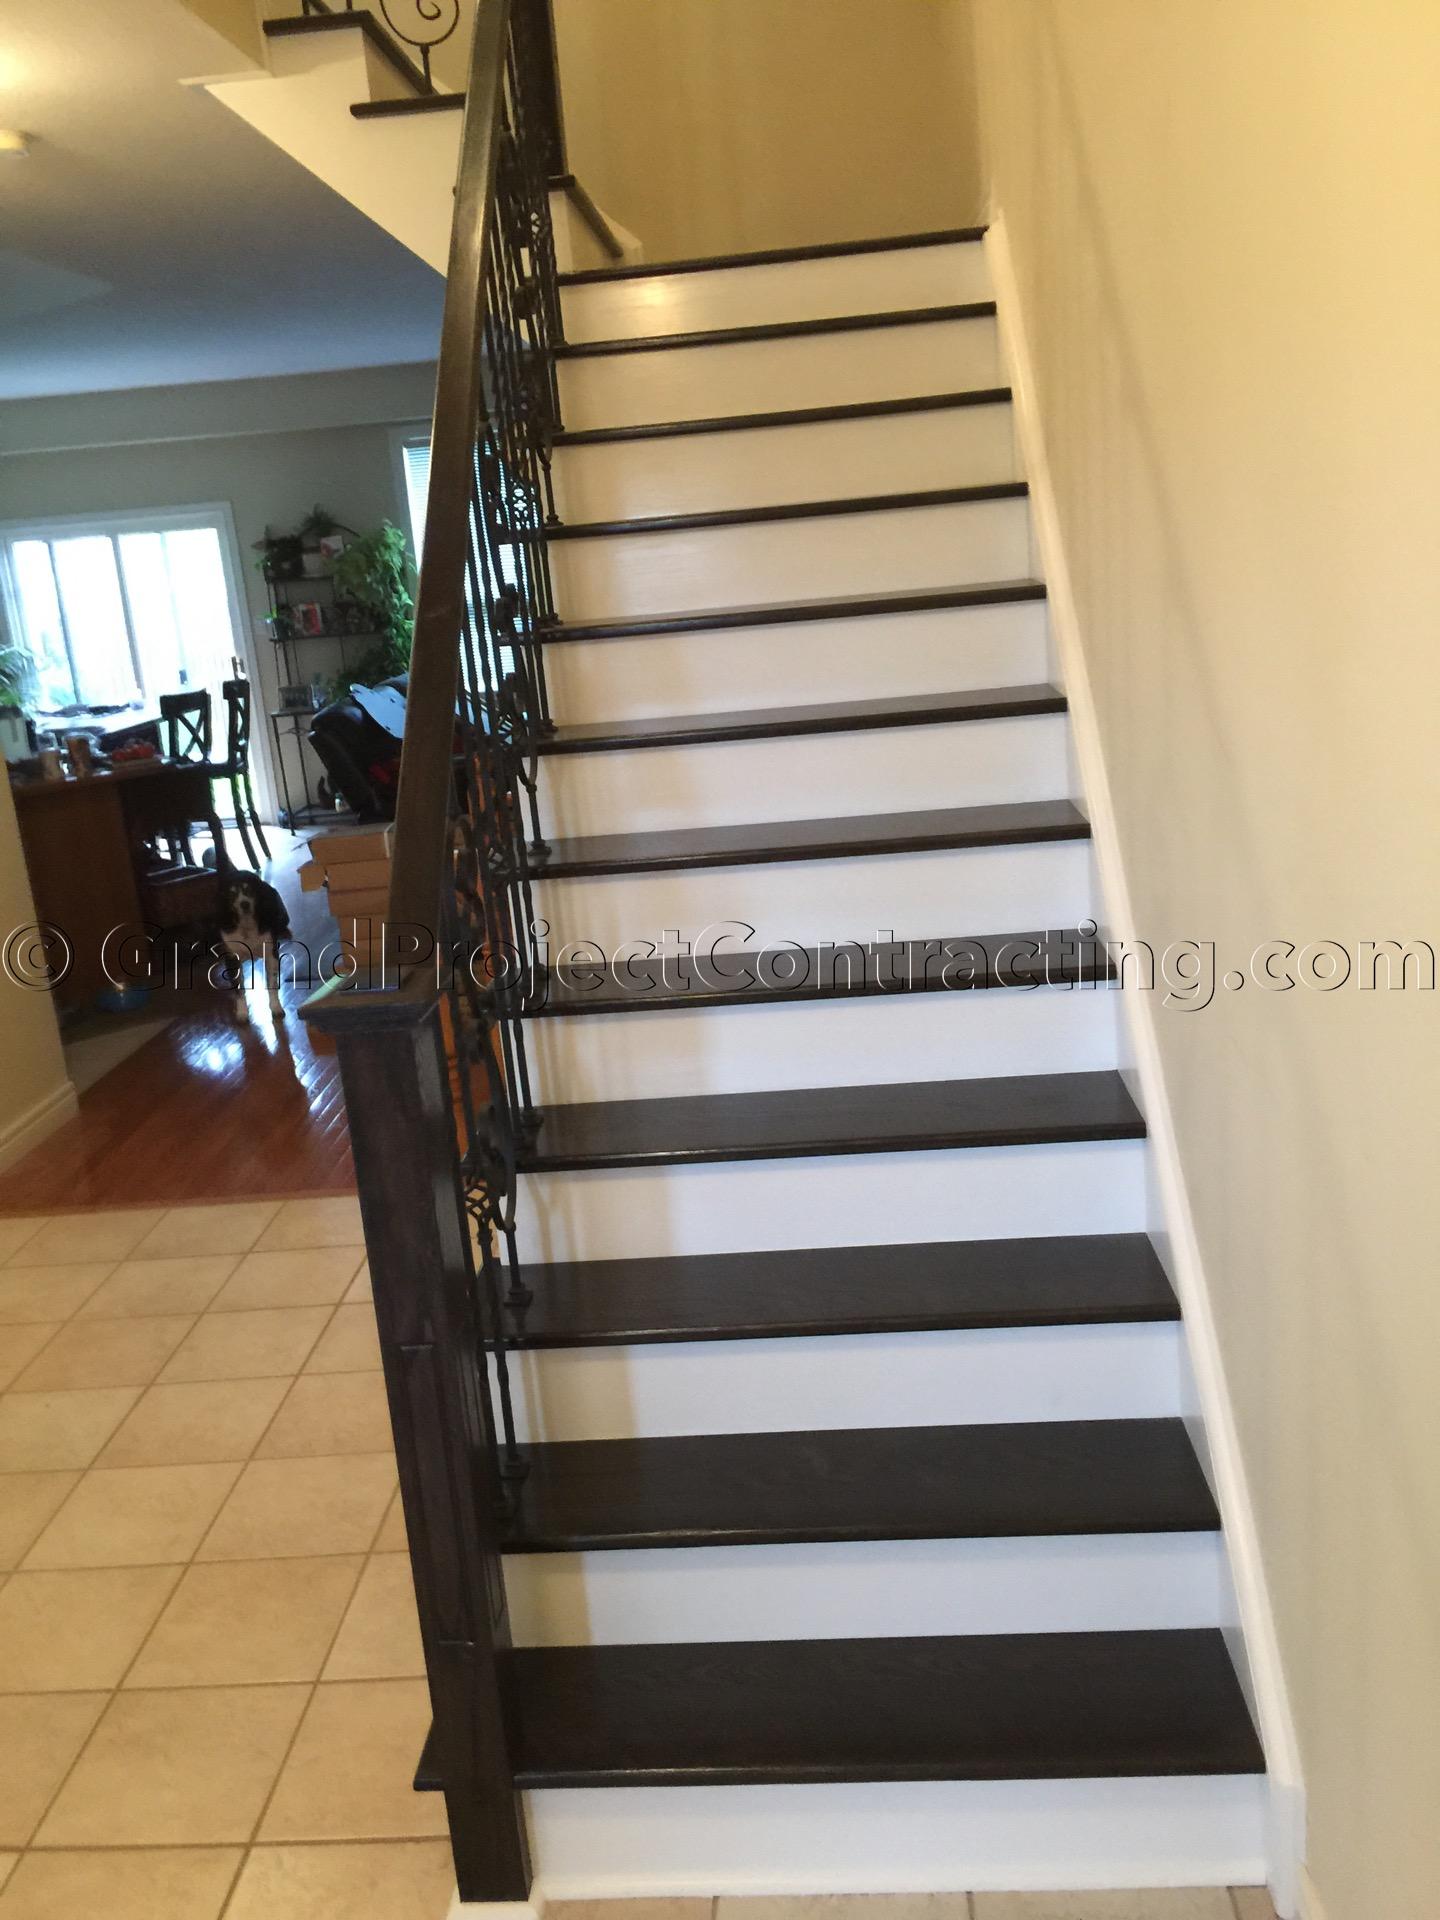 Stair Refinishing And Hardwood Floors Renovation